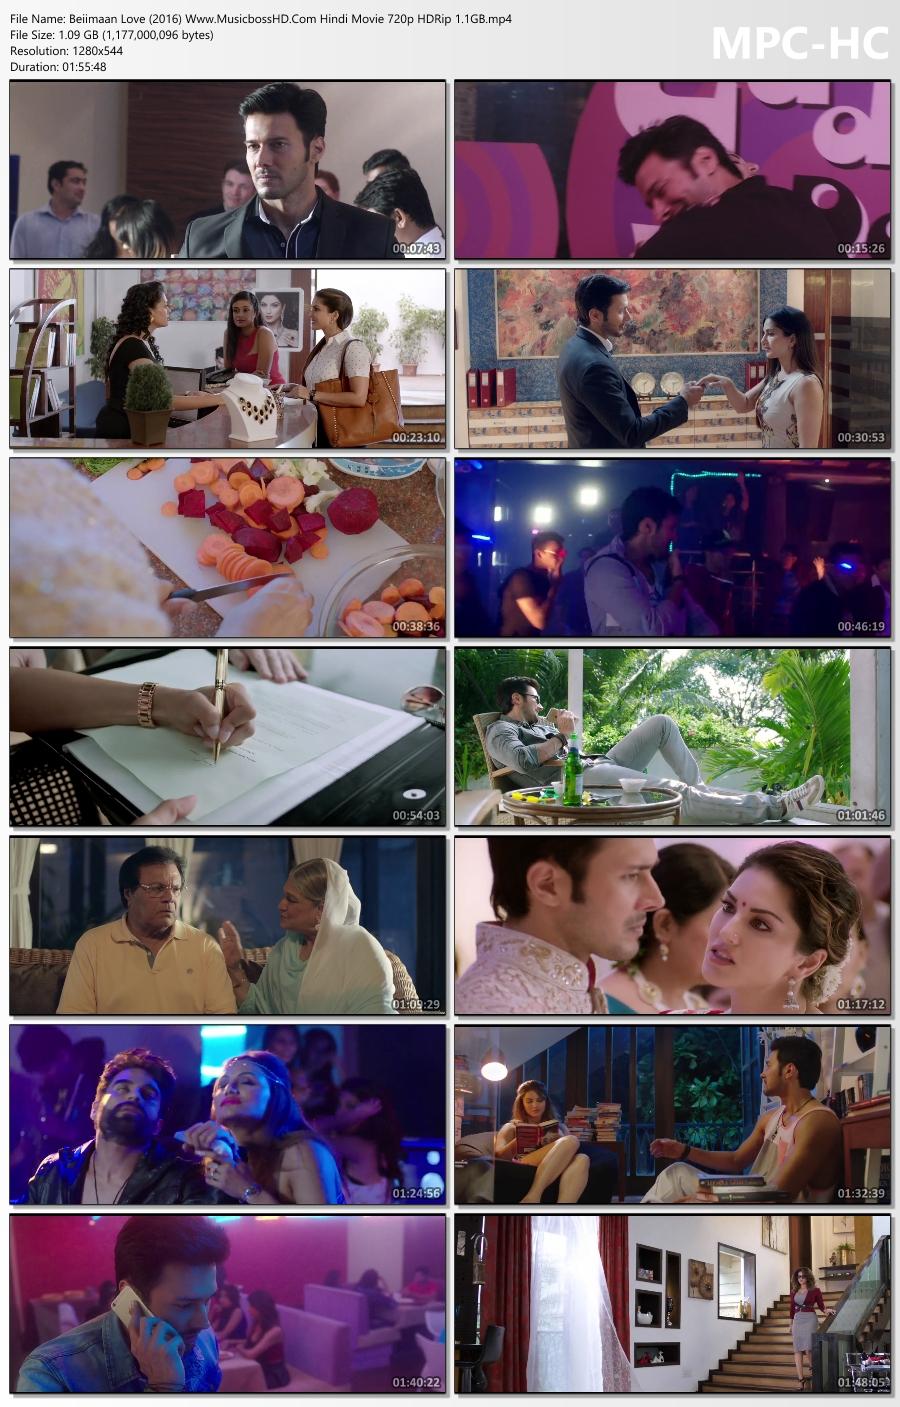 Beiimaan-Love-2016-Www-Musicboss-HD-Com-Hindi-Movie-720p-HDRip-1-1-GB-mp4-thumbs